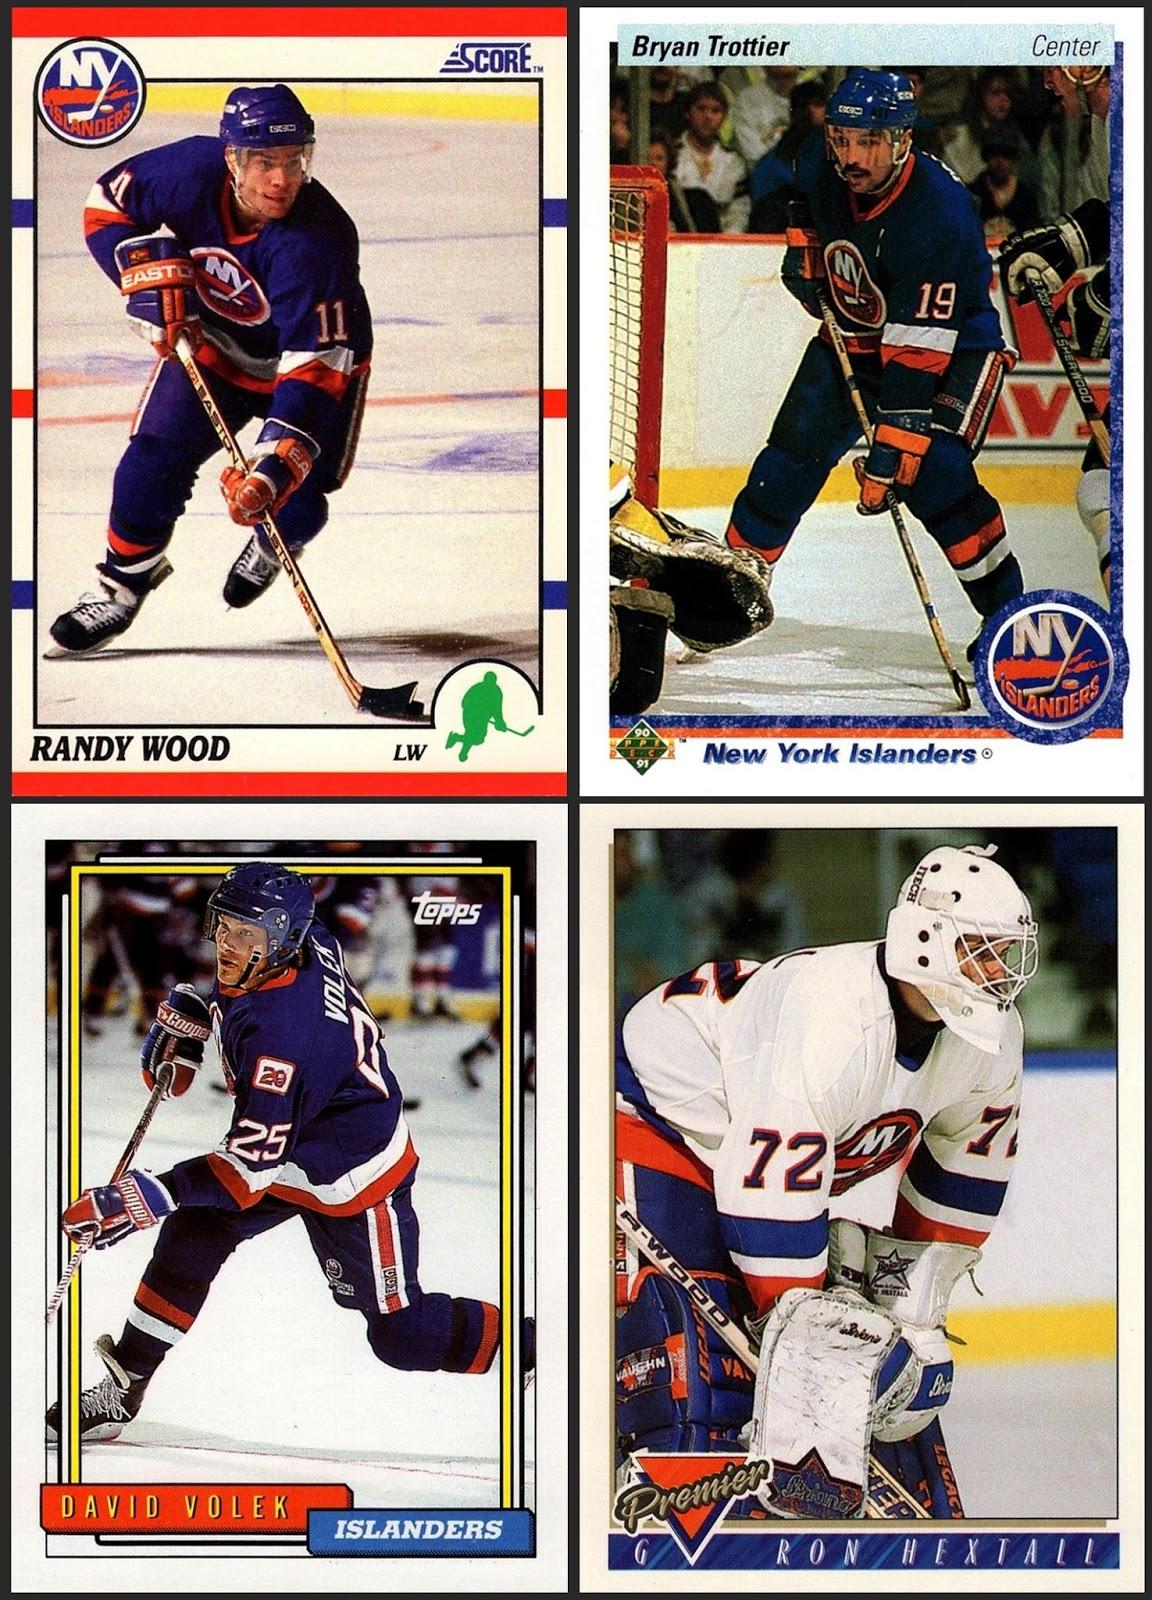 274b38ca9a0 New York Islanders - 4 cards 1990-91 Score American  119 1990-91 Upper Deck   137 1992-93 Topps  204 1993-94 Topps Premier  468